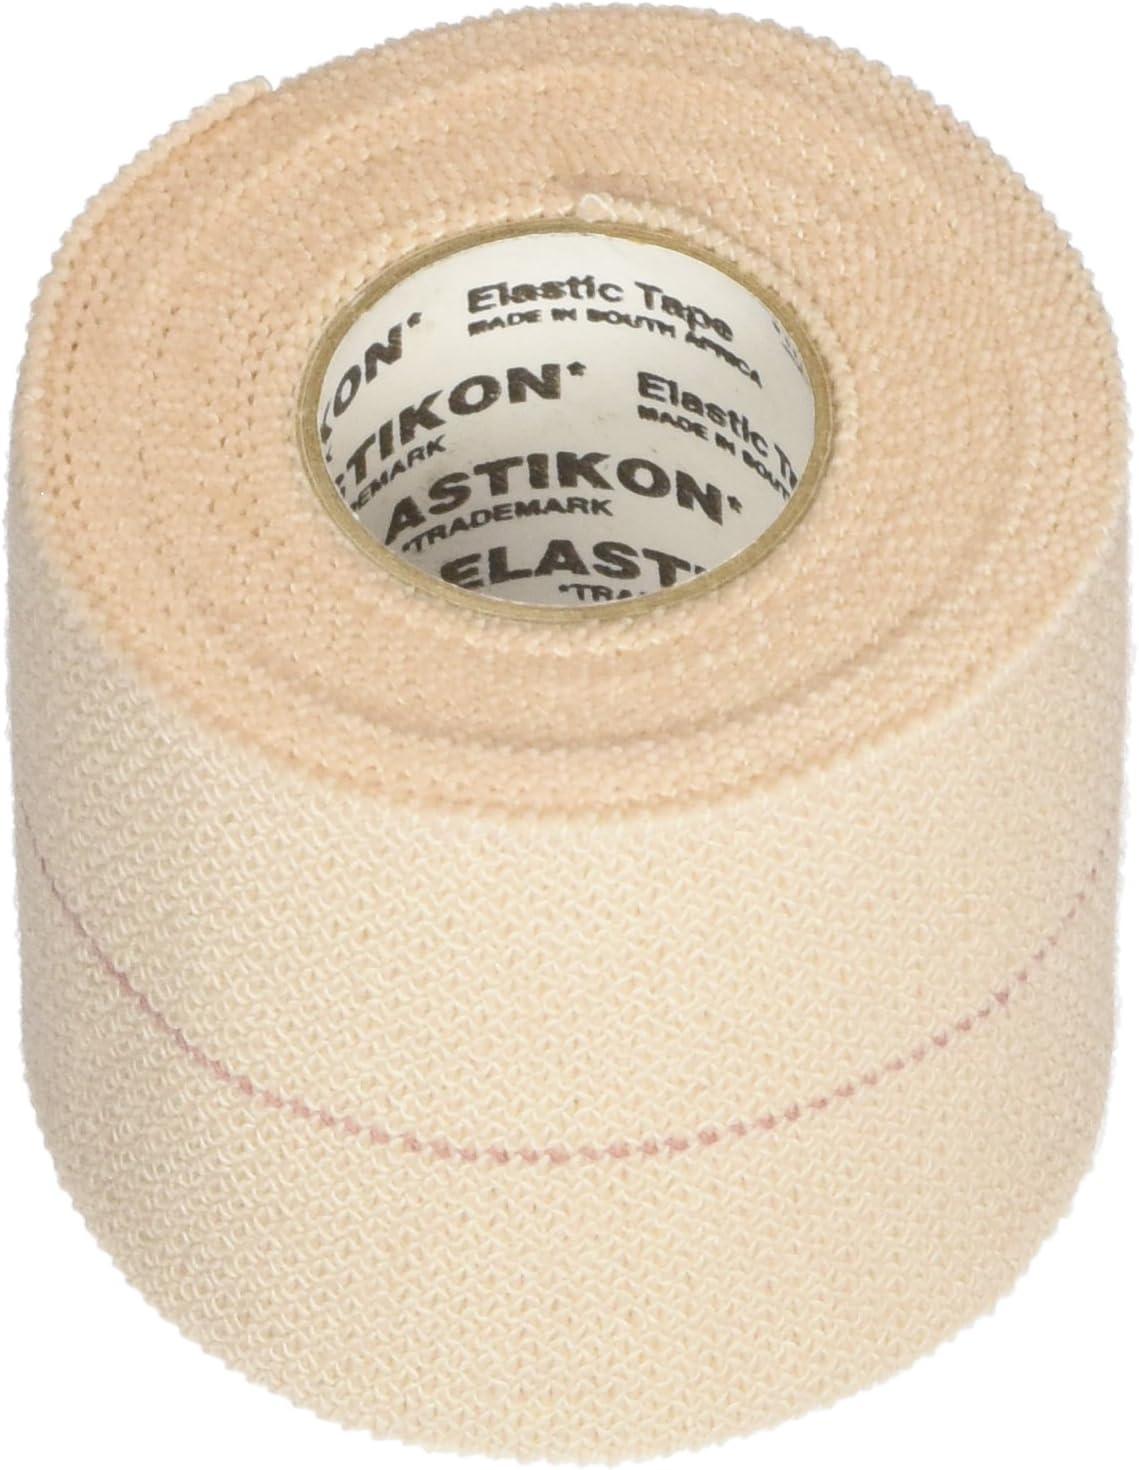 B000GCOI1O J&J HEALTHCARE First Aid Elastikon ElasticTape - 2 Inches X 2.5 yards - 6 rolls 71IIWQ4553L